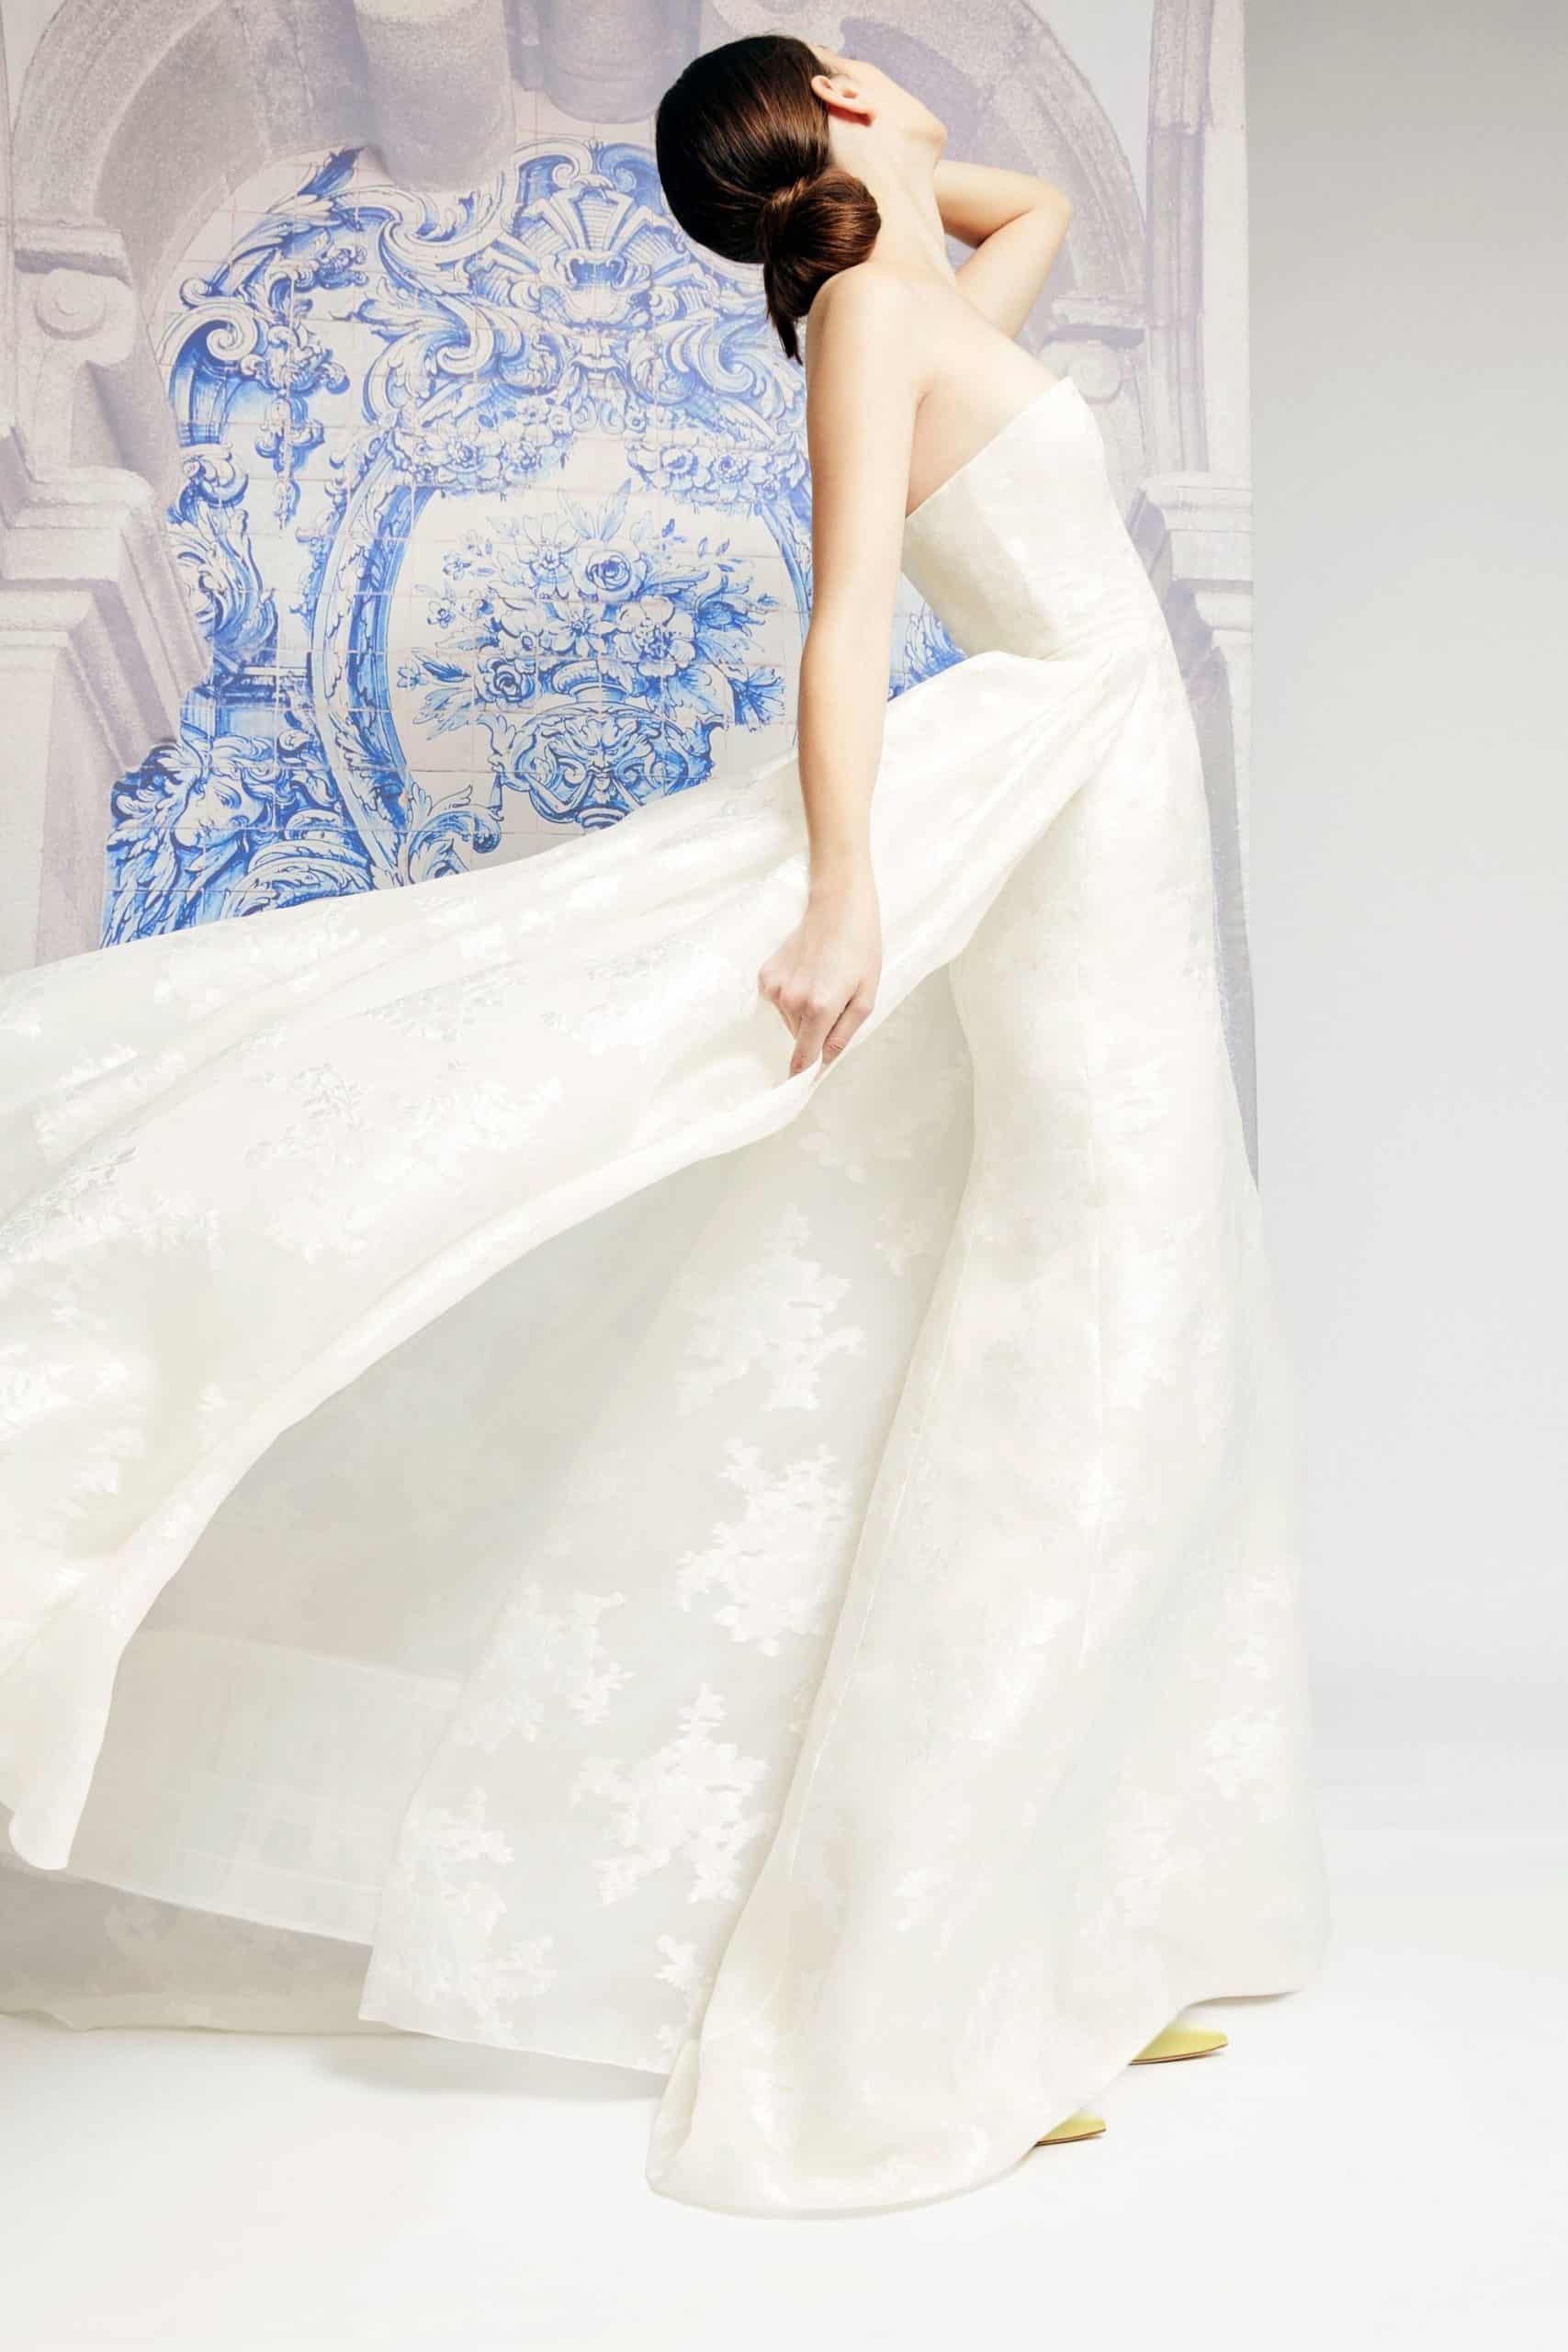 strapless wedding dress with extra tail fall 2019 by Carolina Herrera